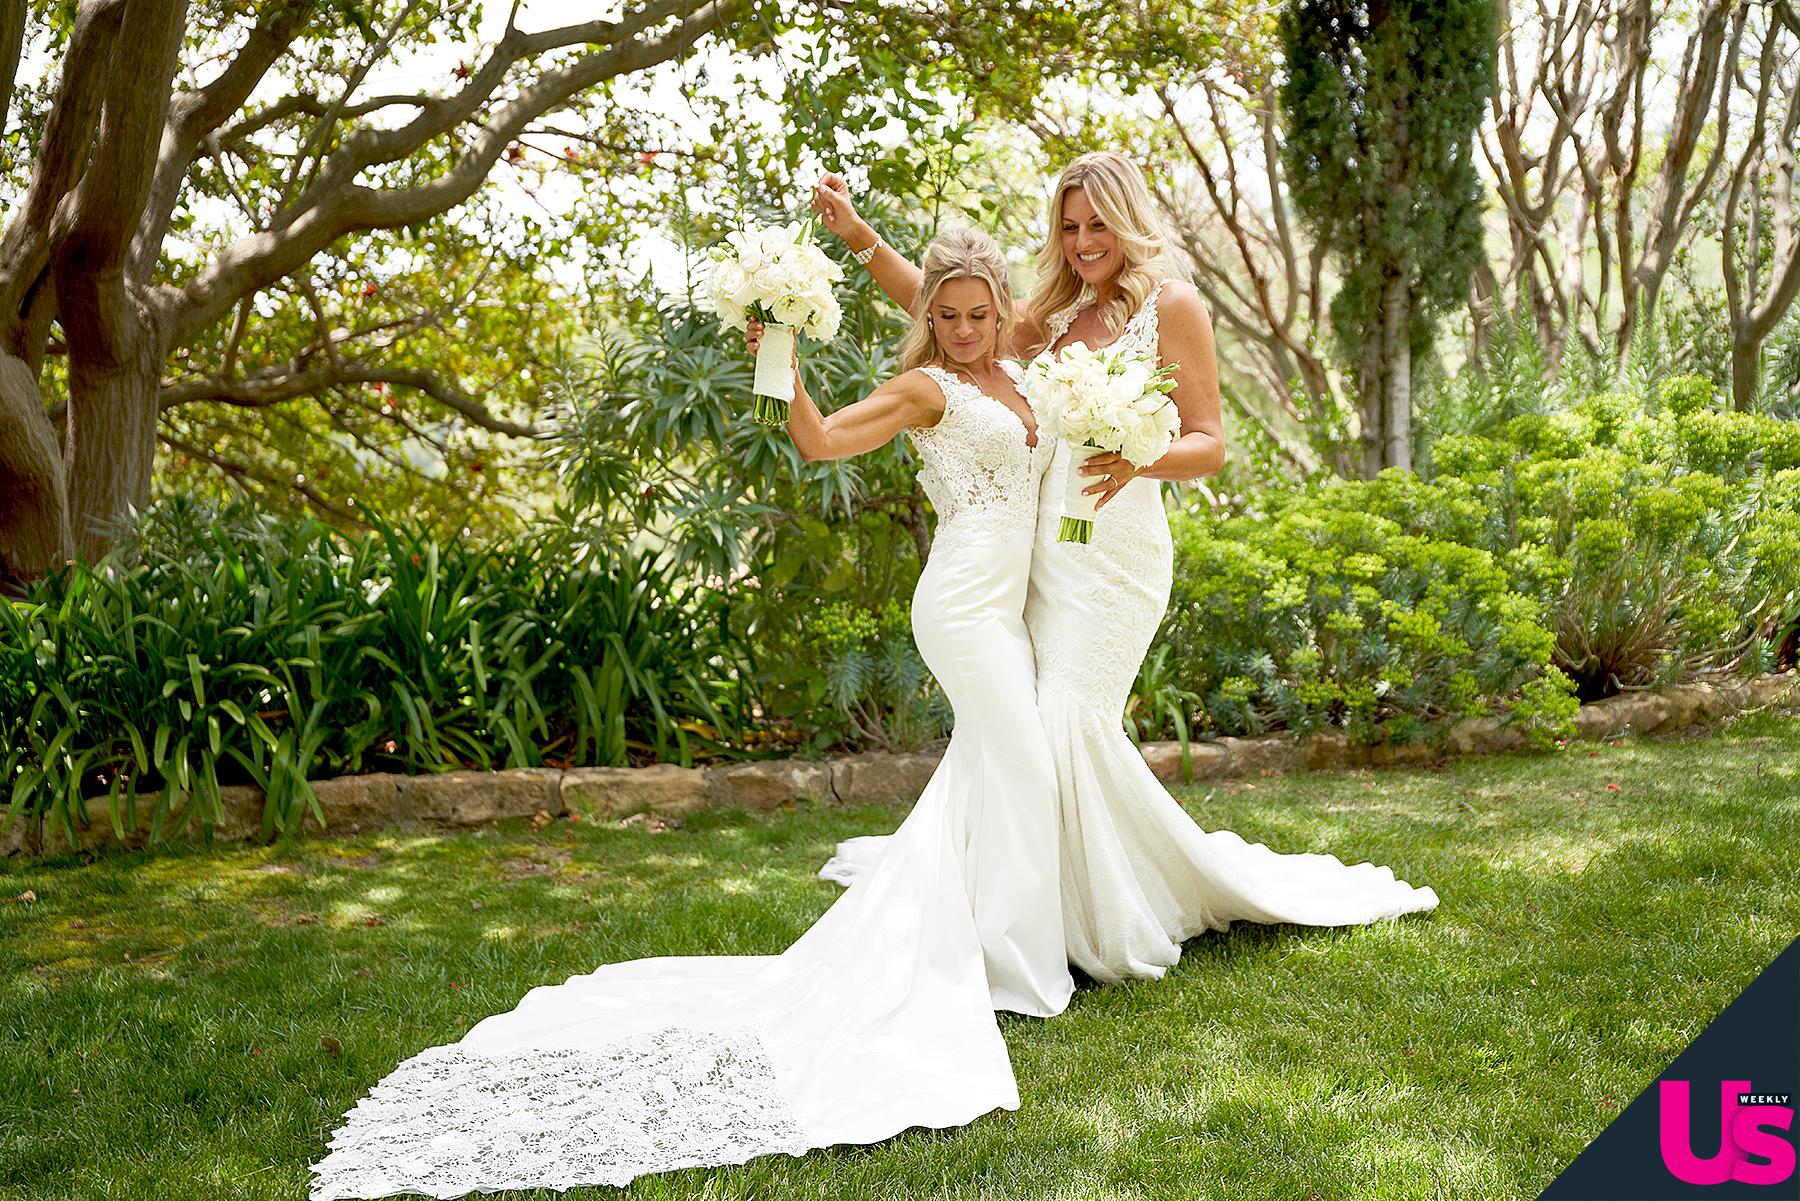 Cat Cora And Nicole Ehrlich's 'Perfect' Wedding Day On ZIG